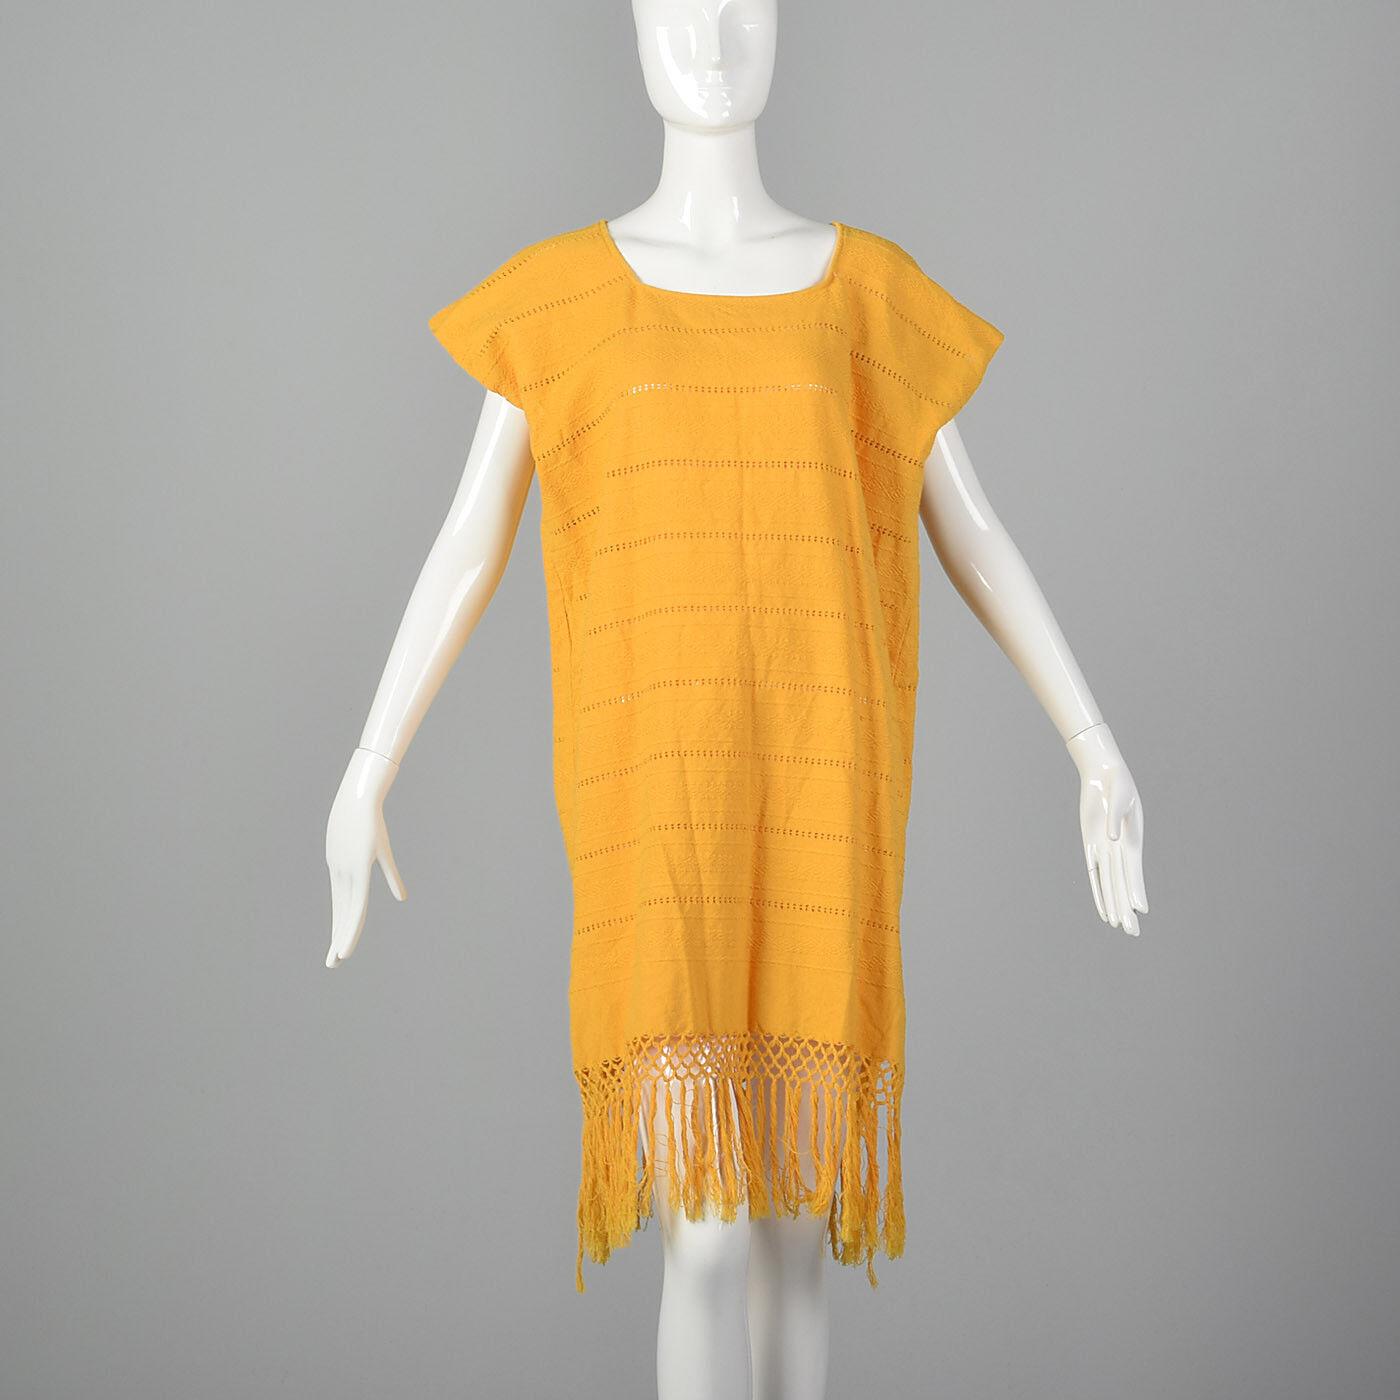 Medium Yellow Poncho 1980s Swimsuit Cover Up Summer VTG Beach Dress Sleeveless